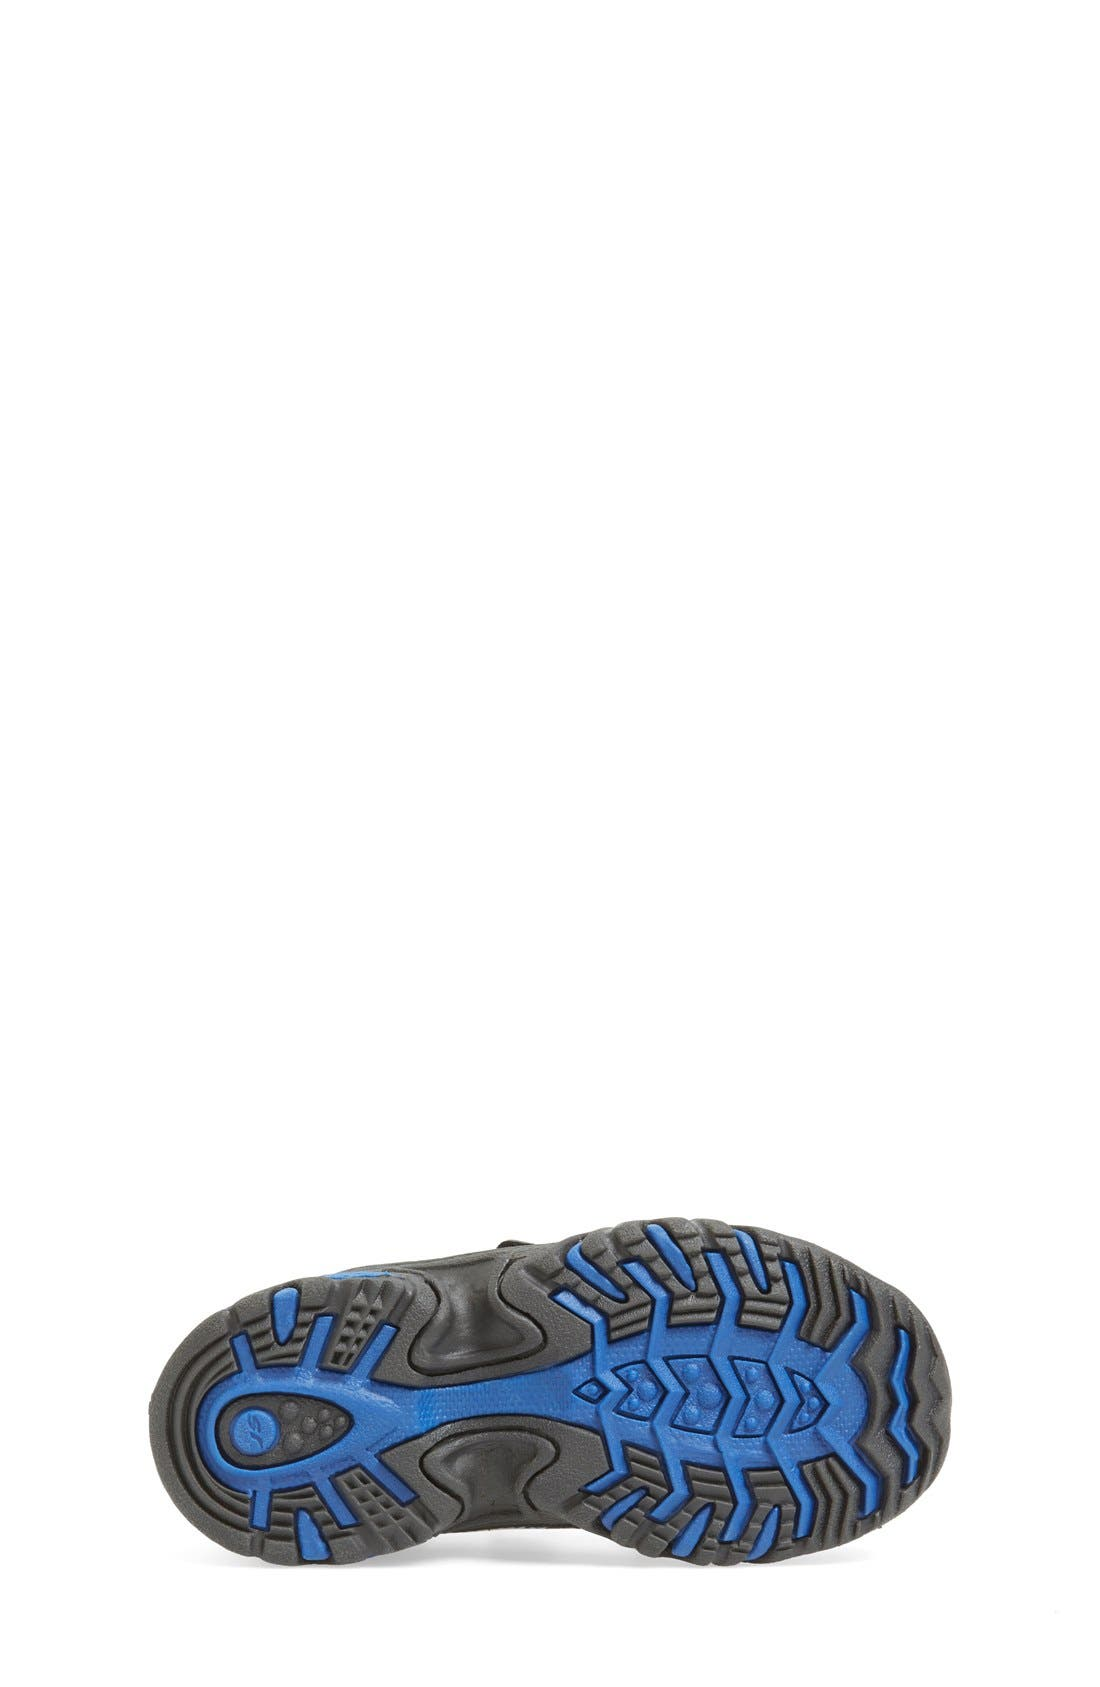 'Vroomz - Police Car' Light-Up Sneaker,                             Alternate thumbnail 3, color,                             001